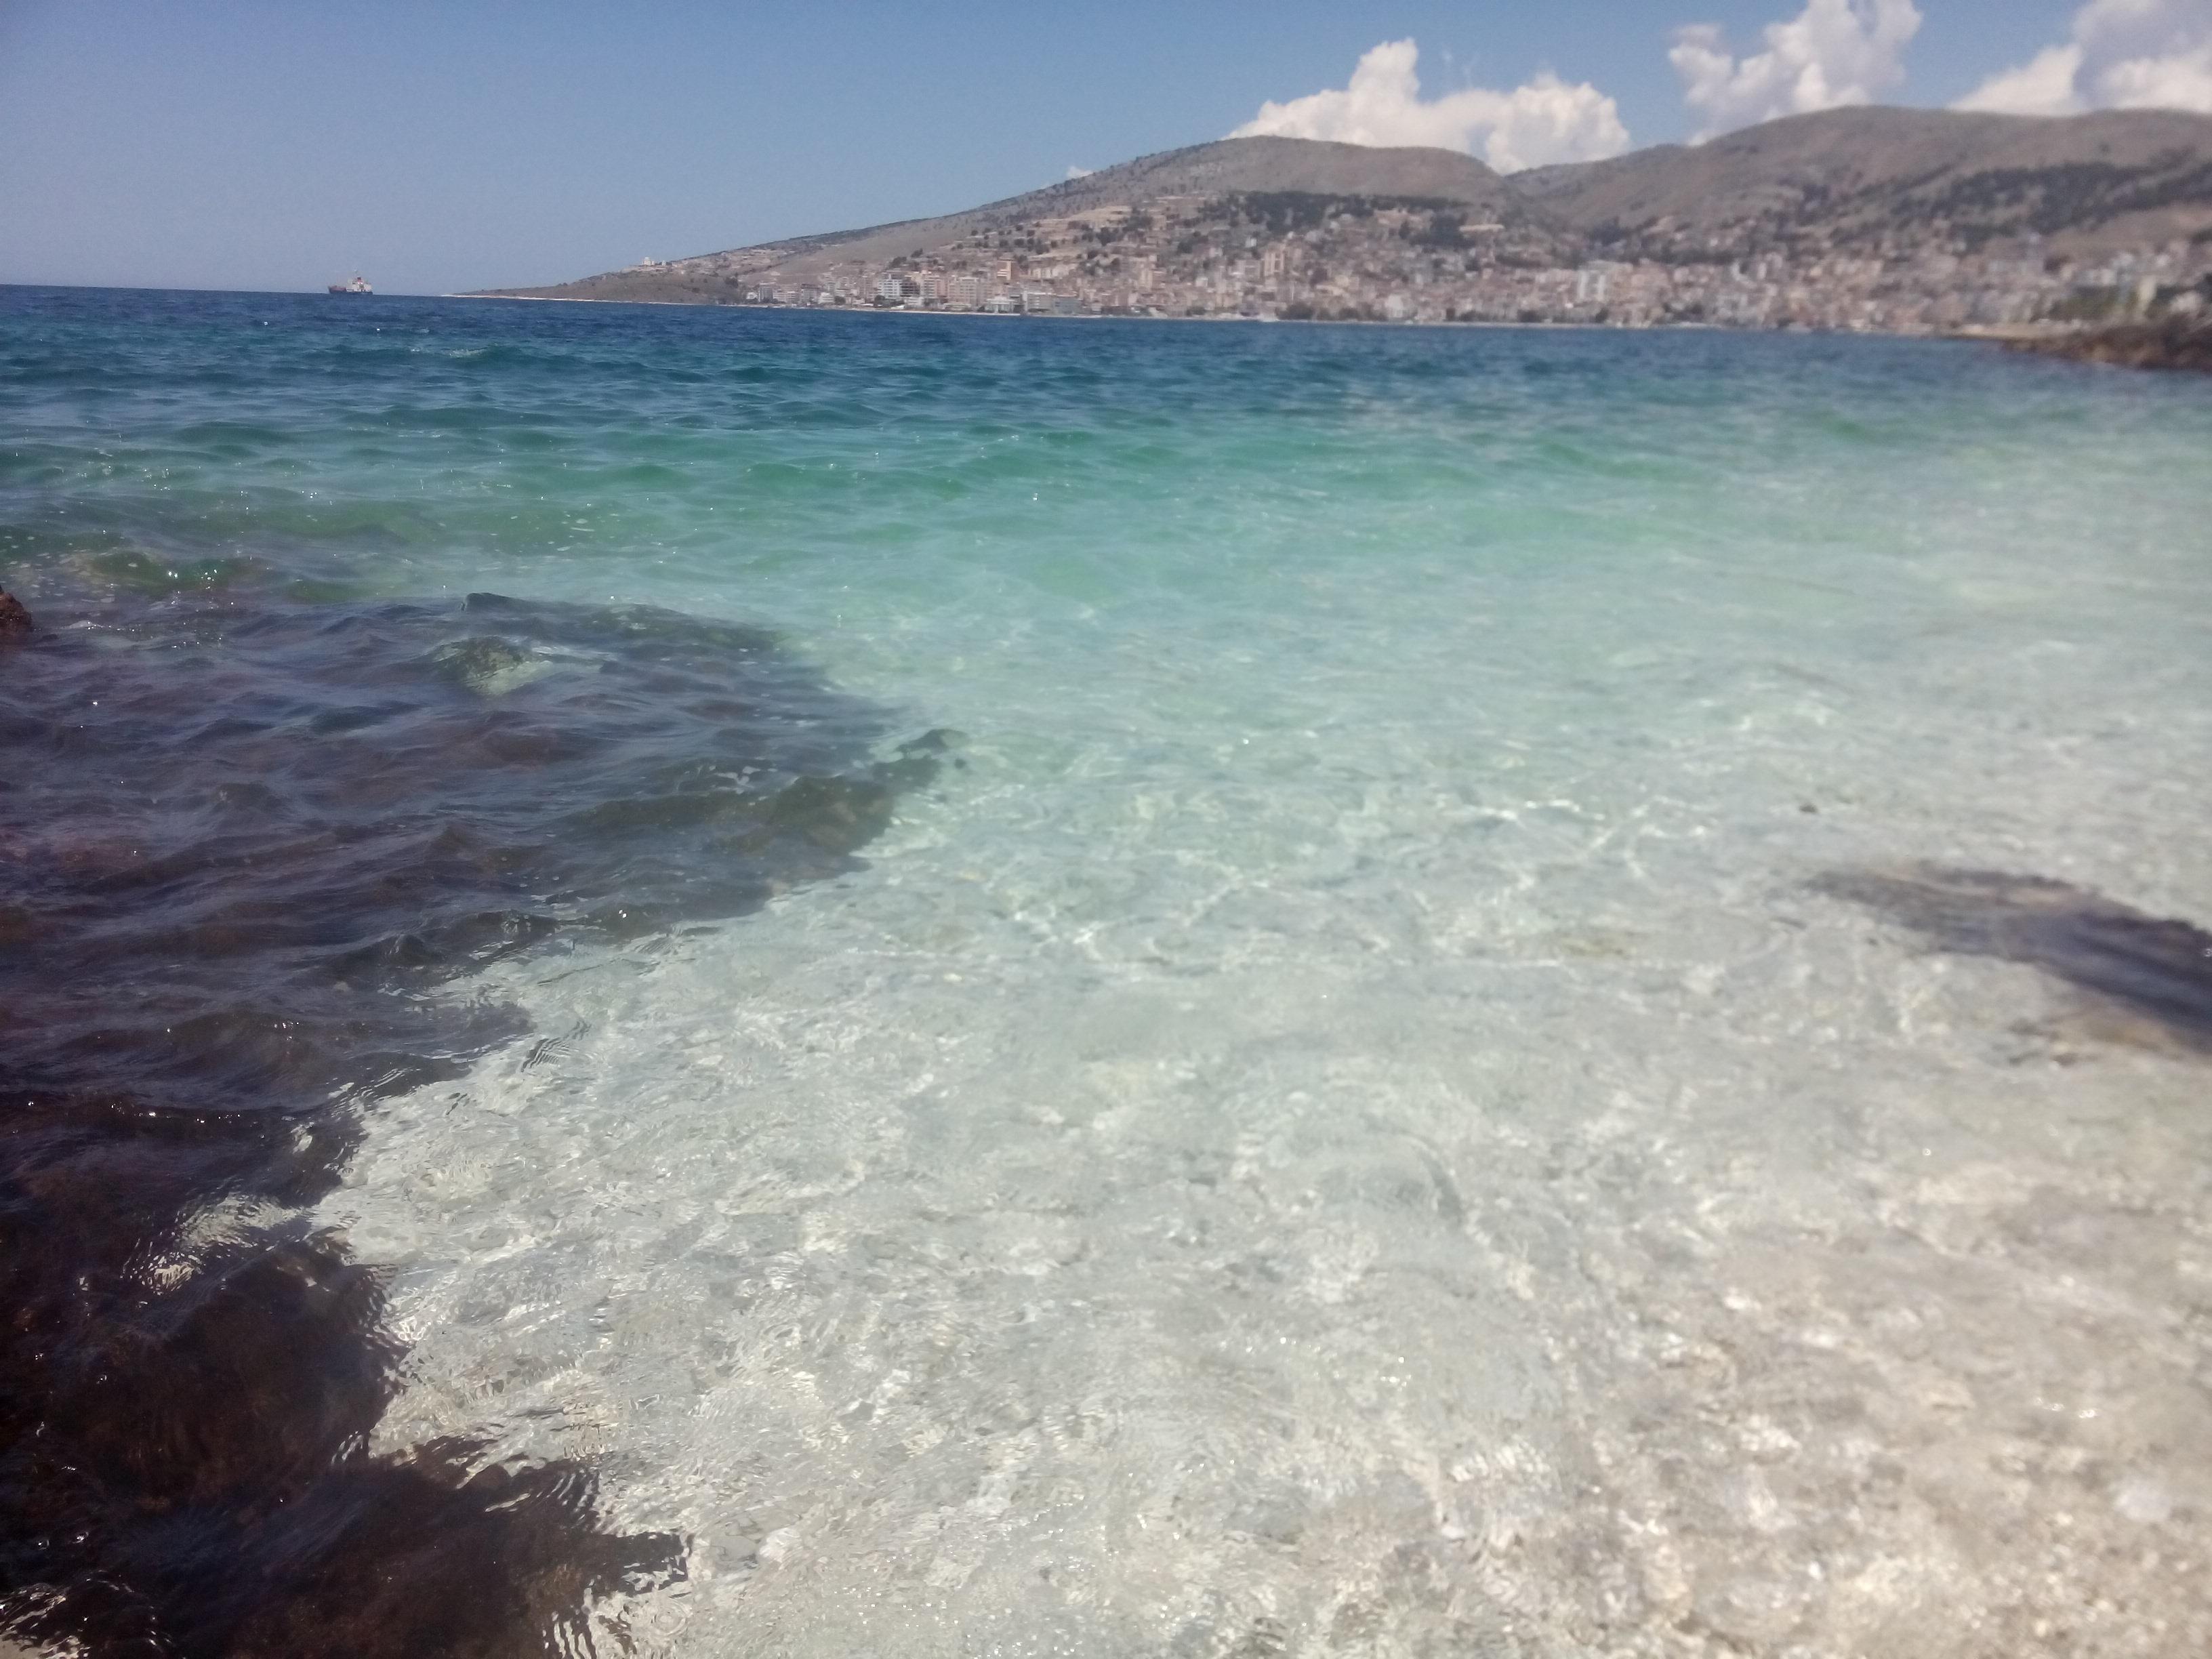 Clear seawater reflecting the sun